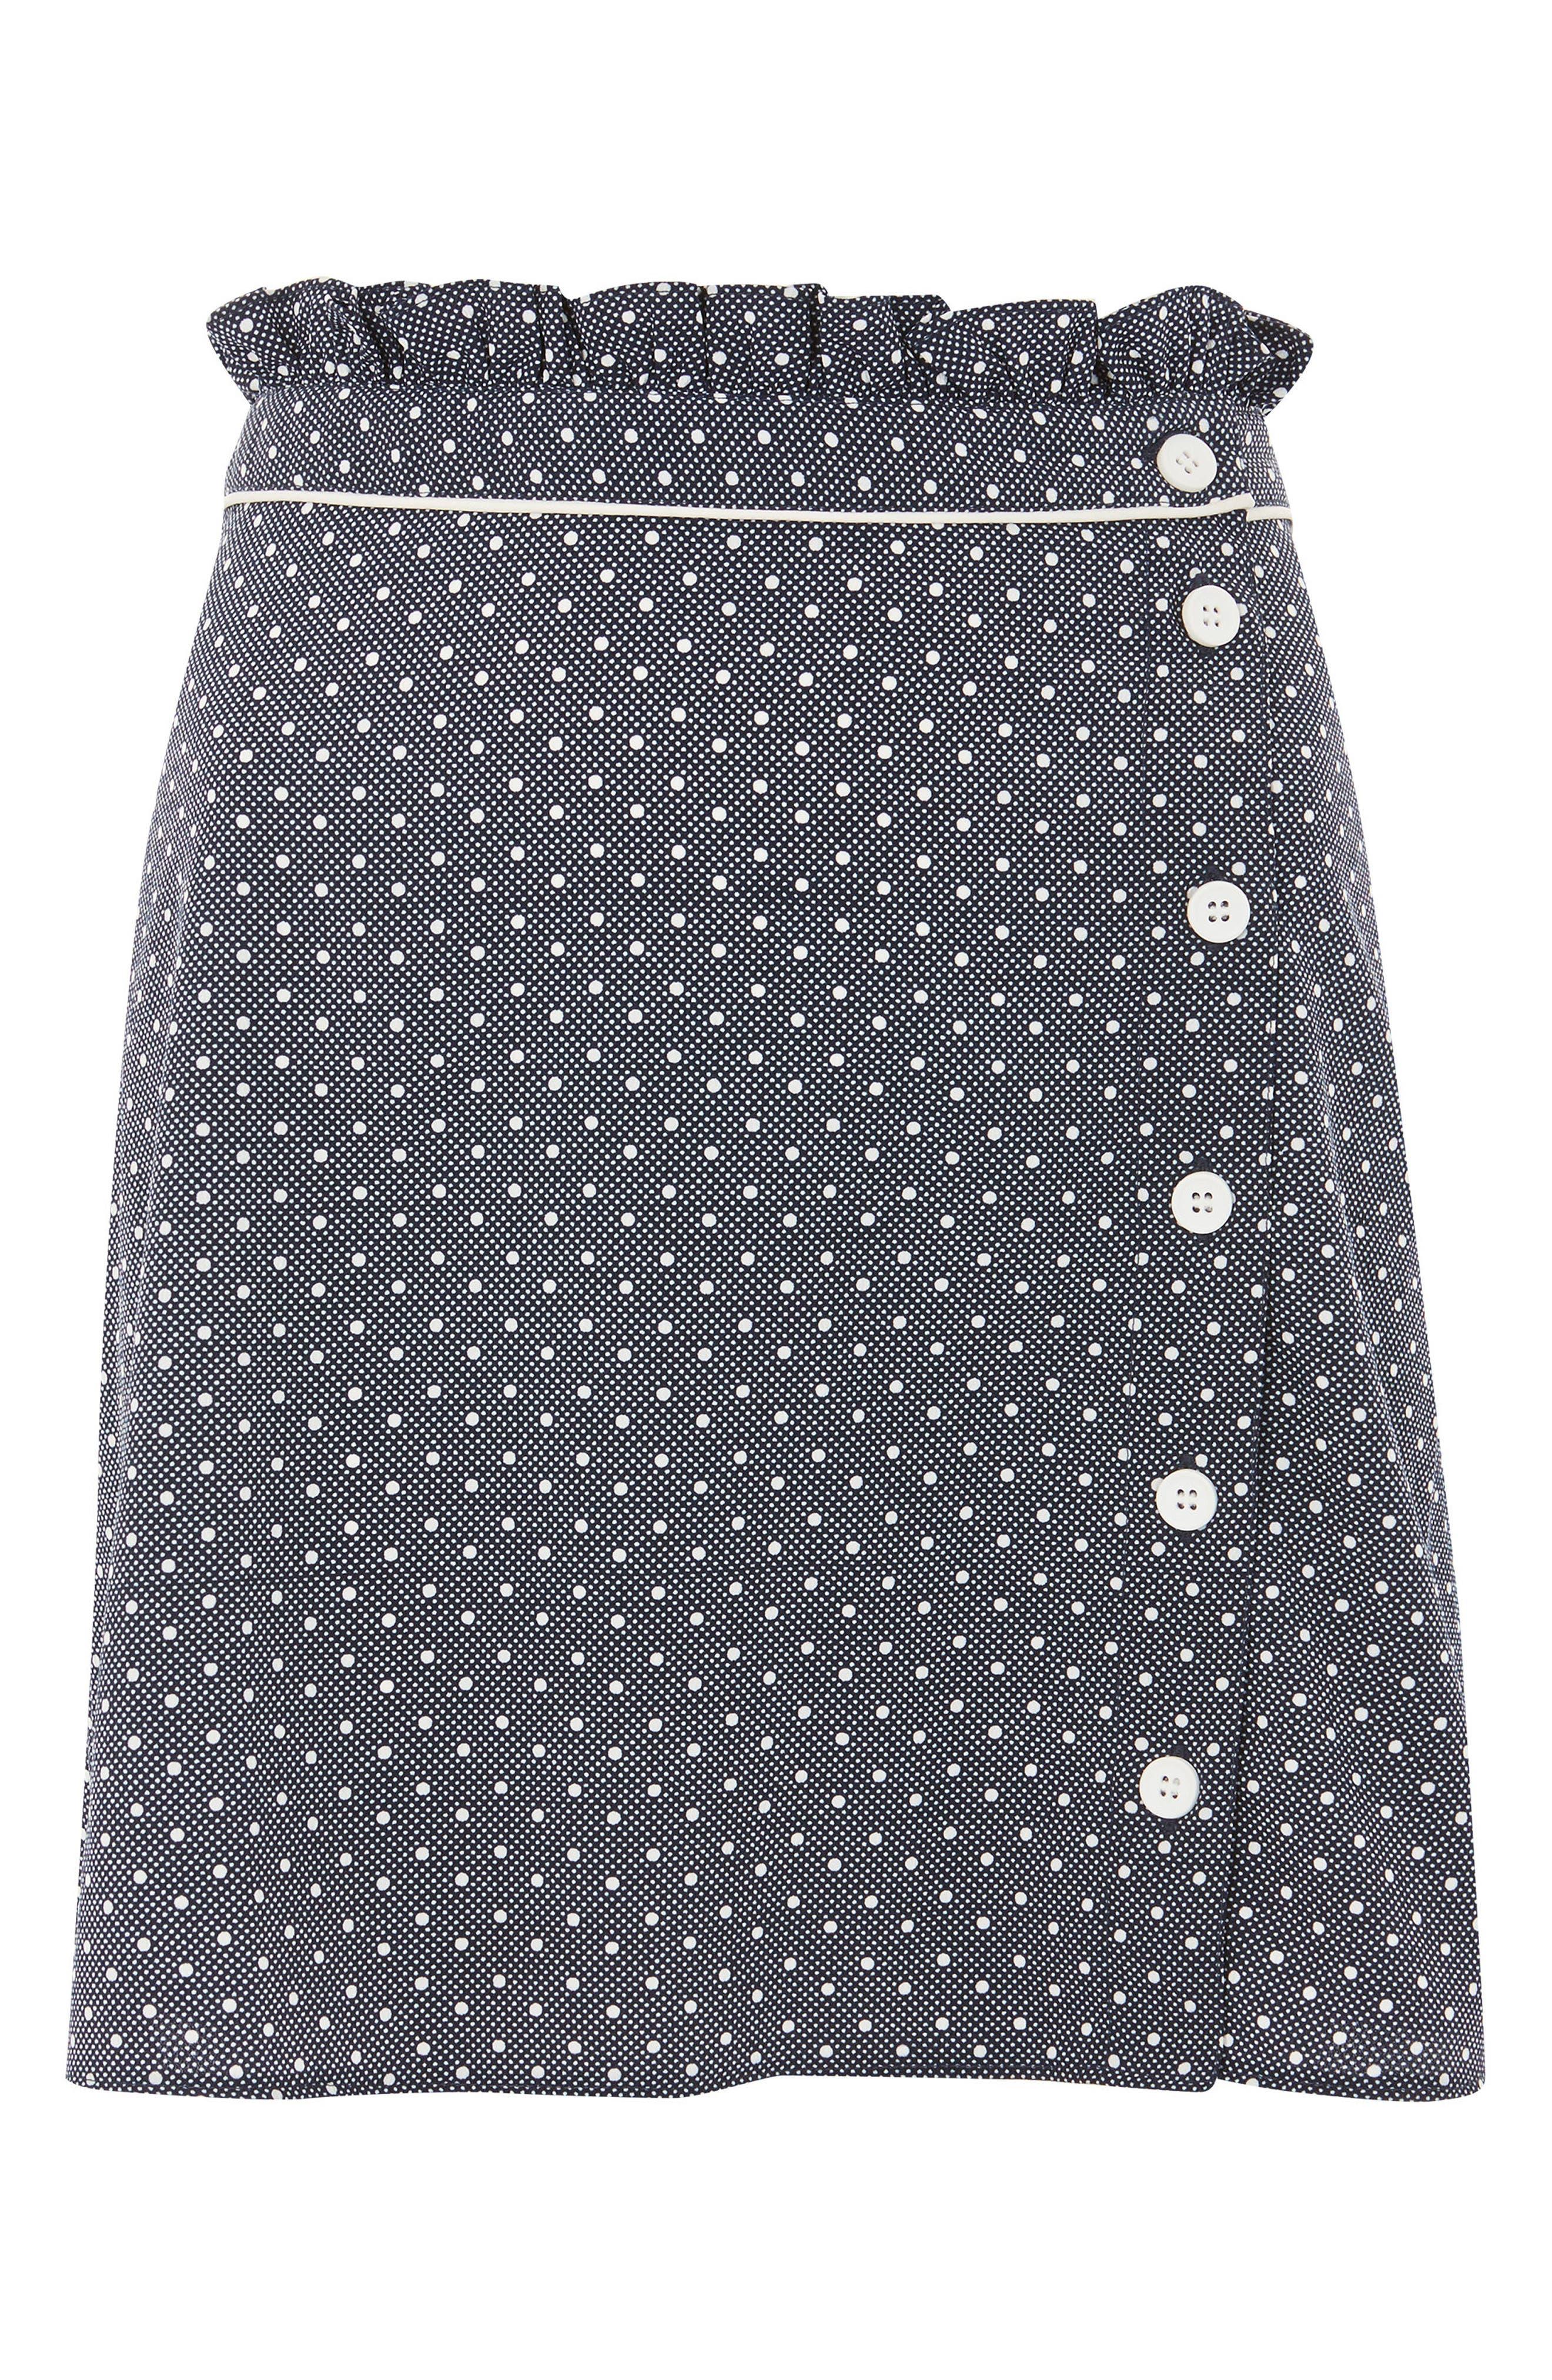 Spot Ruffle Miniskirt,                             Alternate thumbnail 3, color,                             411